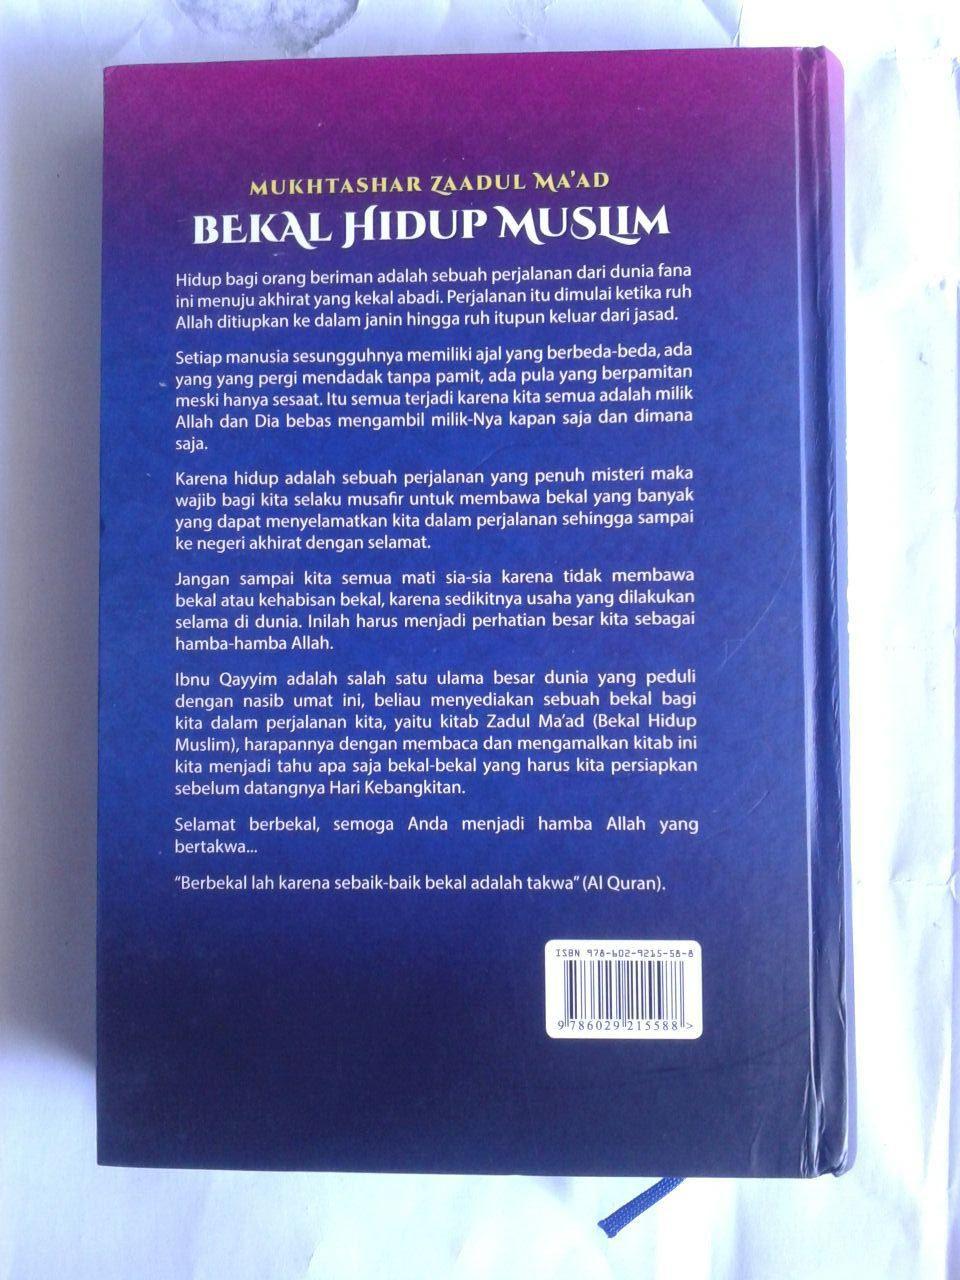 Buku Mukhtashar Zaadul Maad Bekal Hidup Muslim cover 3